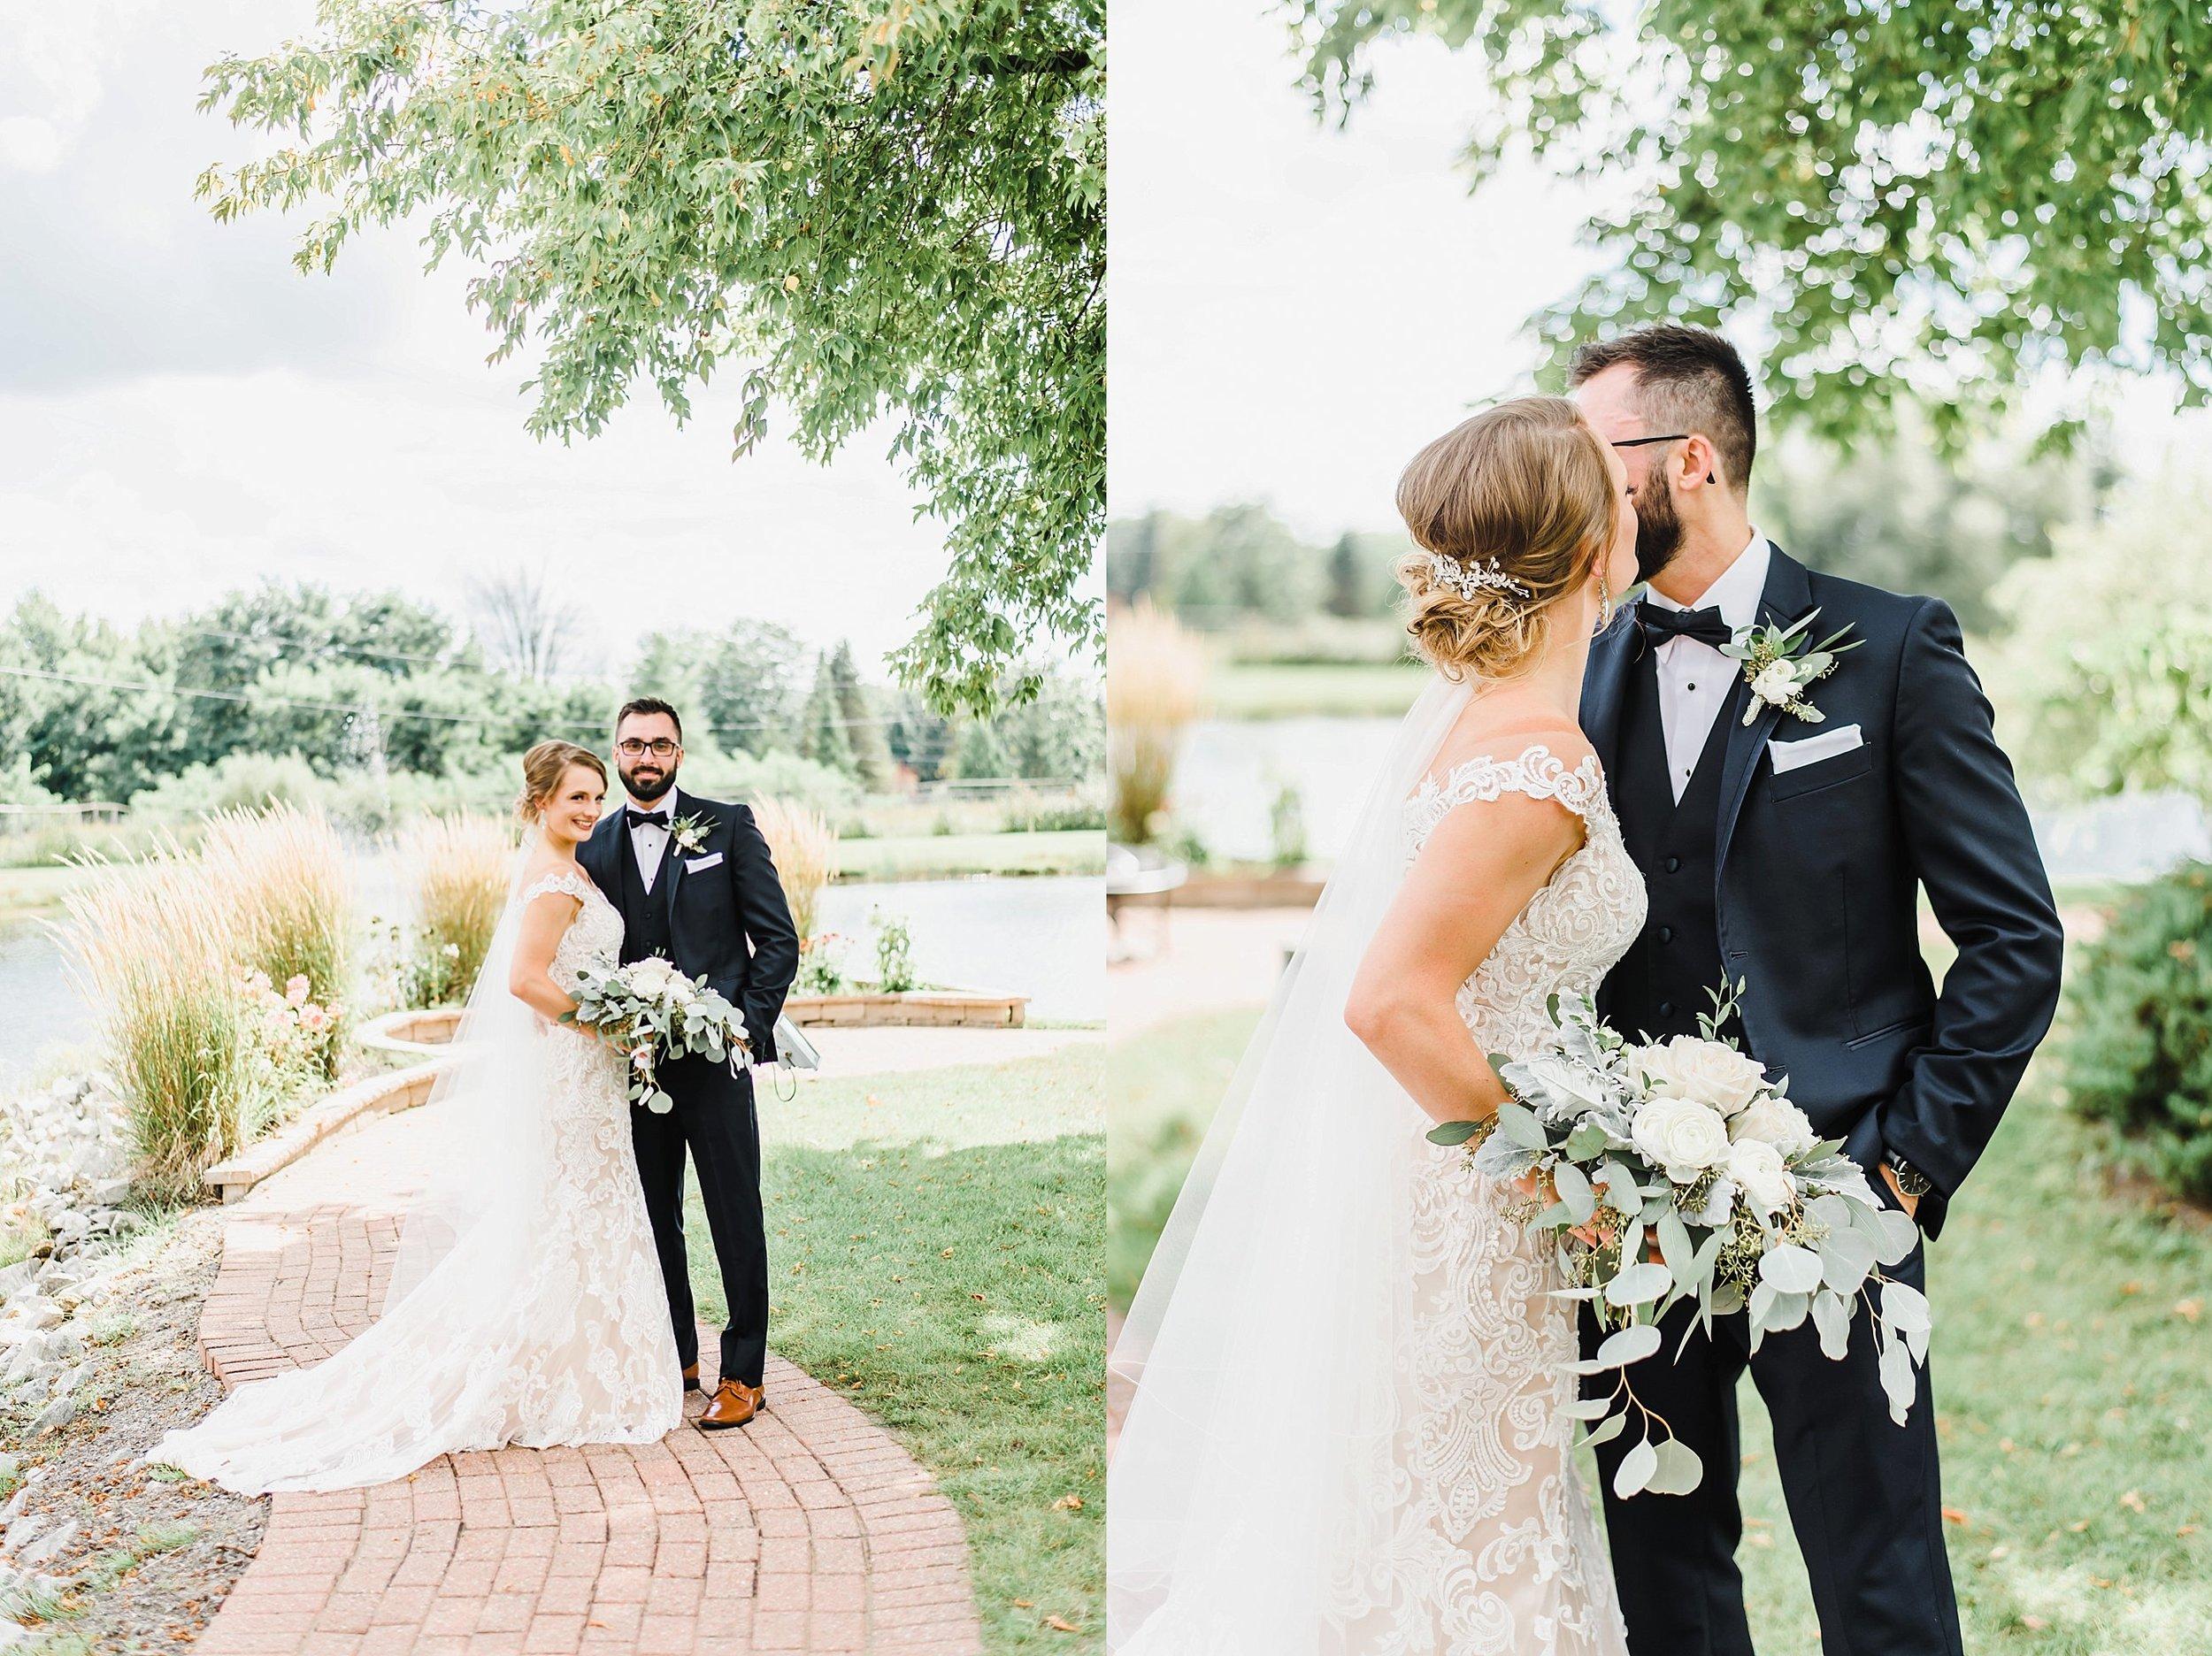 light airy indie fine art ottawa wedding photographer | Ali and Batoul Photography_1246.jpg